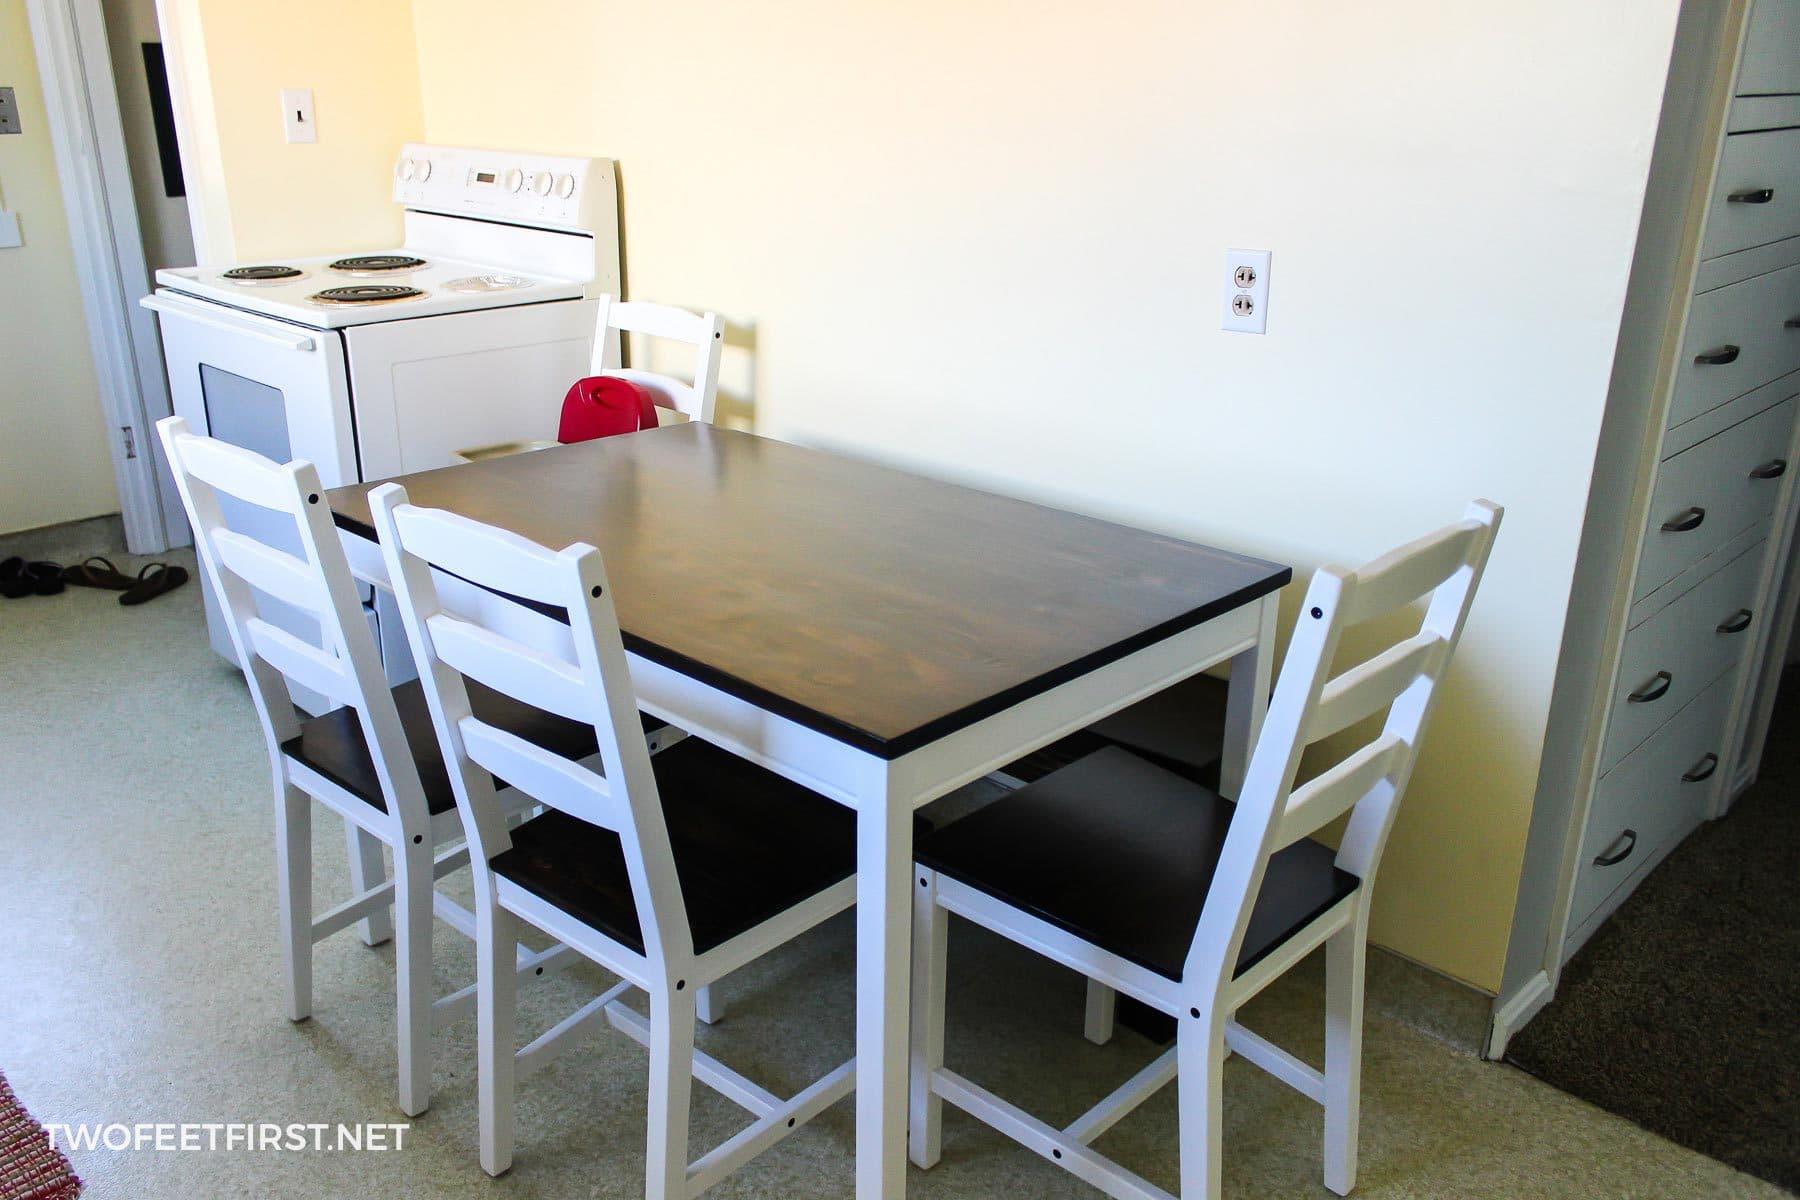 diy ikea furniture. Updated Ikea Table To Farmhouse Diy Ikea Furniture